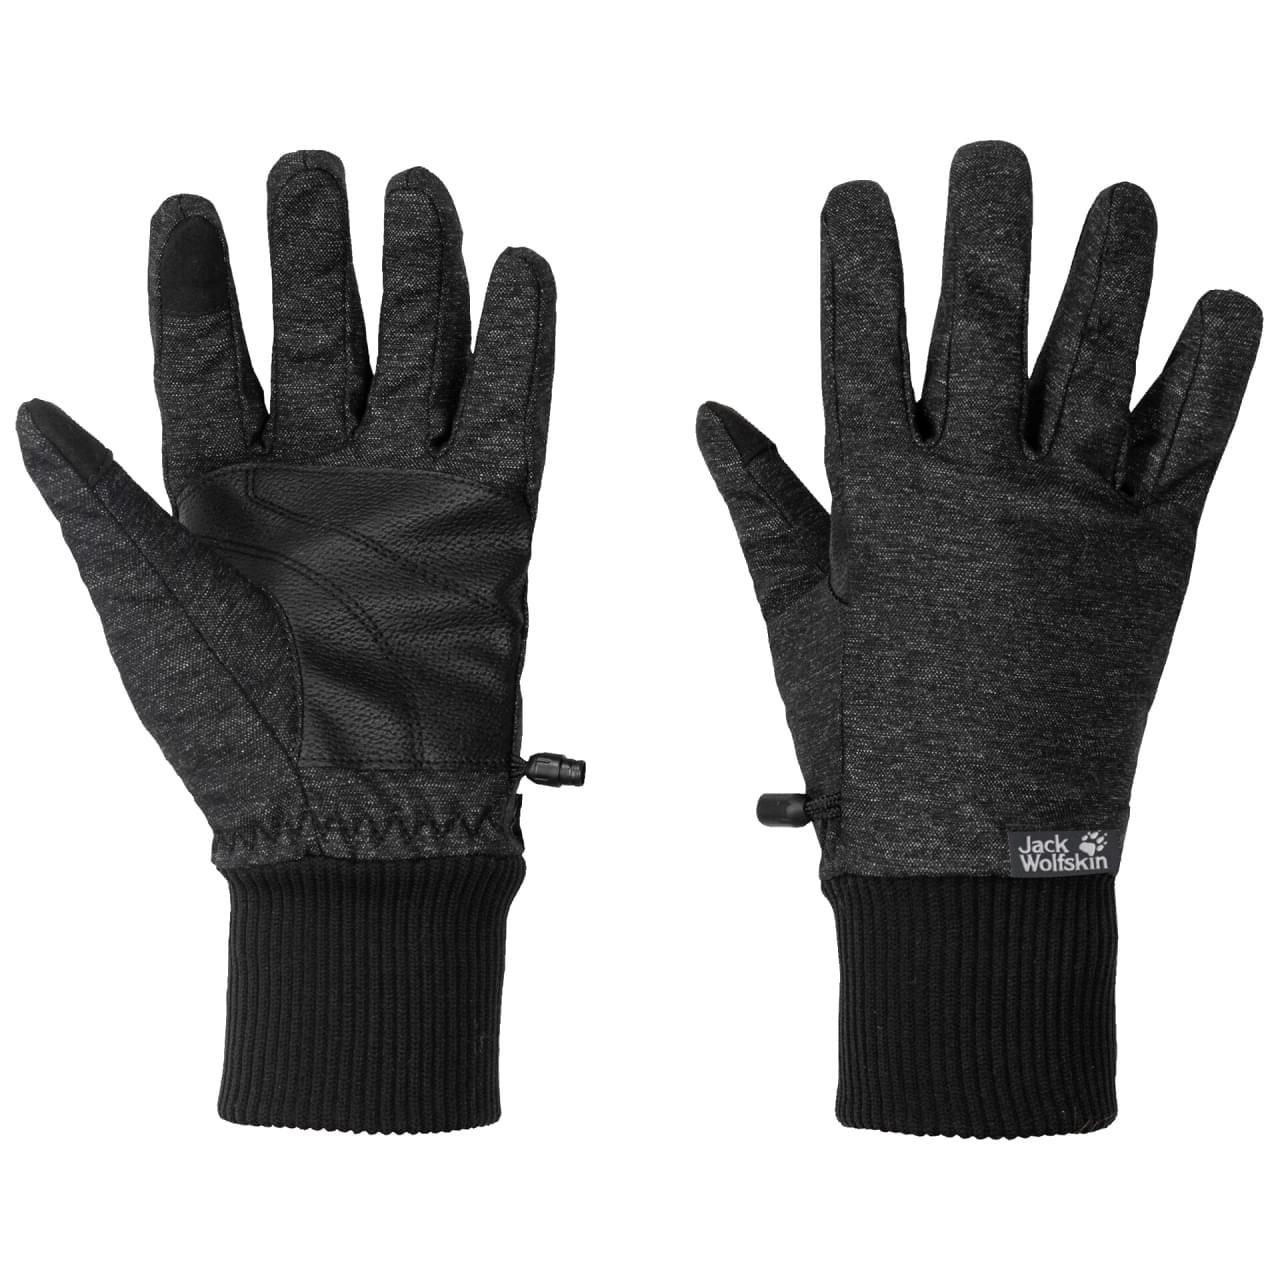 Jack Wolfskin Winter Travel Handschoenen Dames